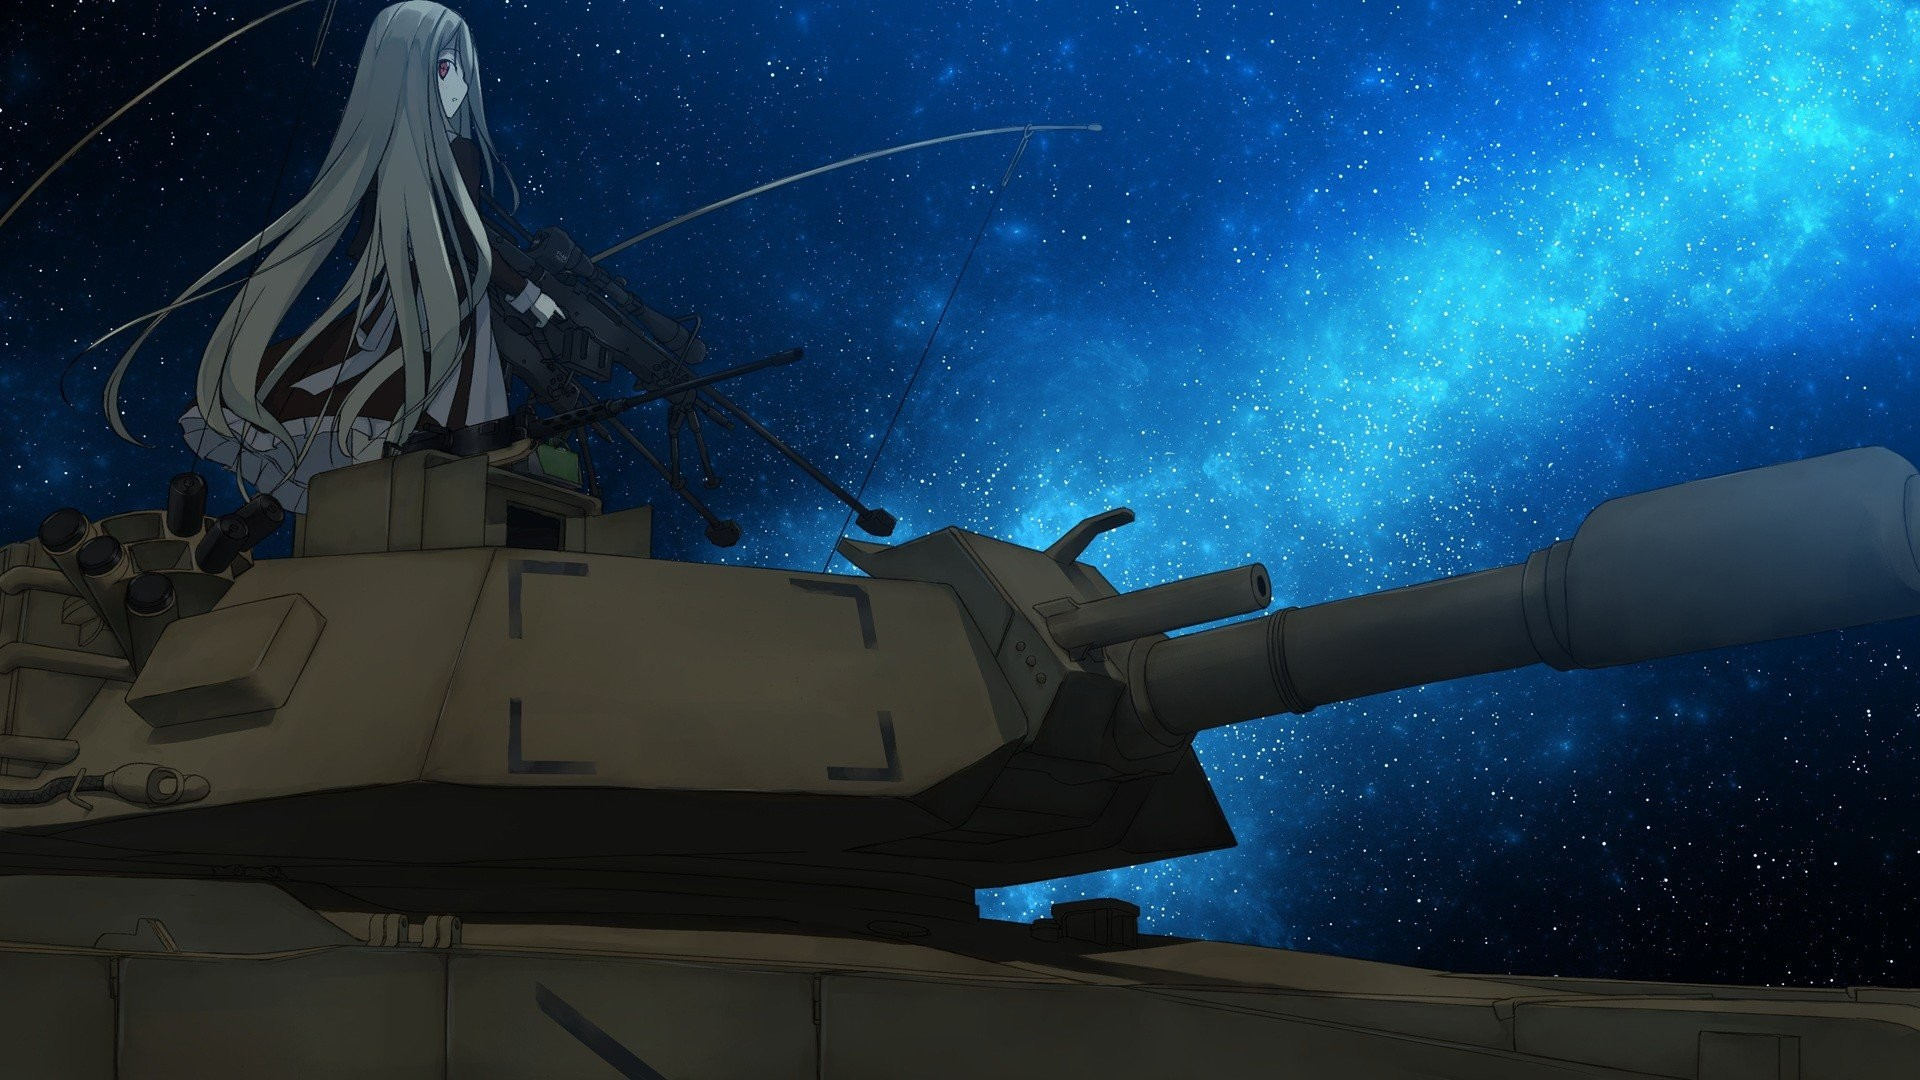 Night stars tanks sniper rifles anime girls skies original characters  wallpaper     285088   WallpaperUP